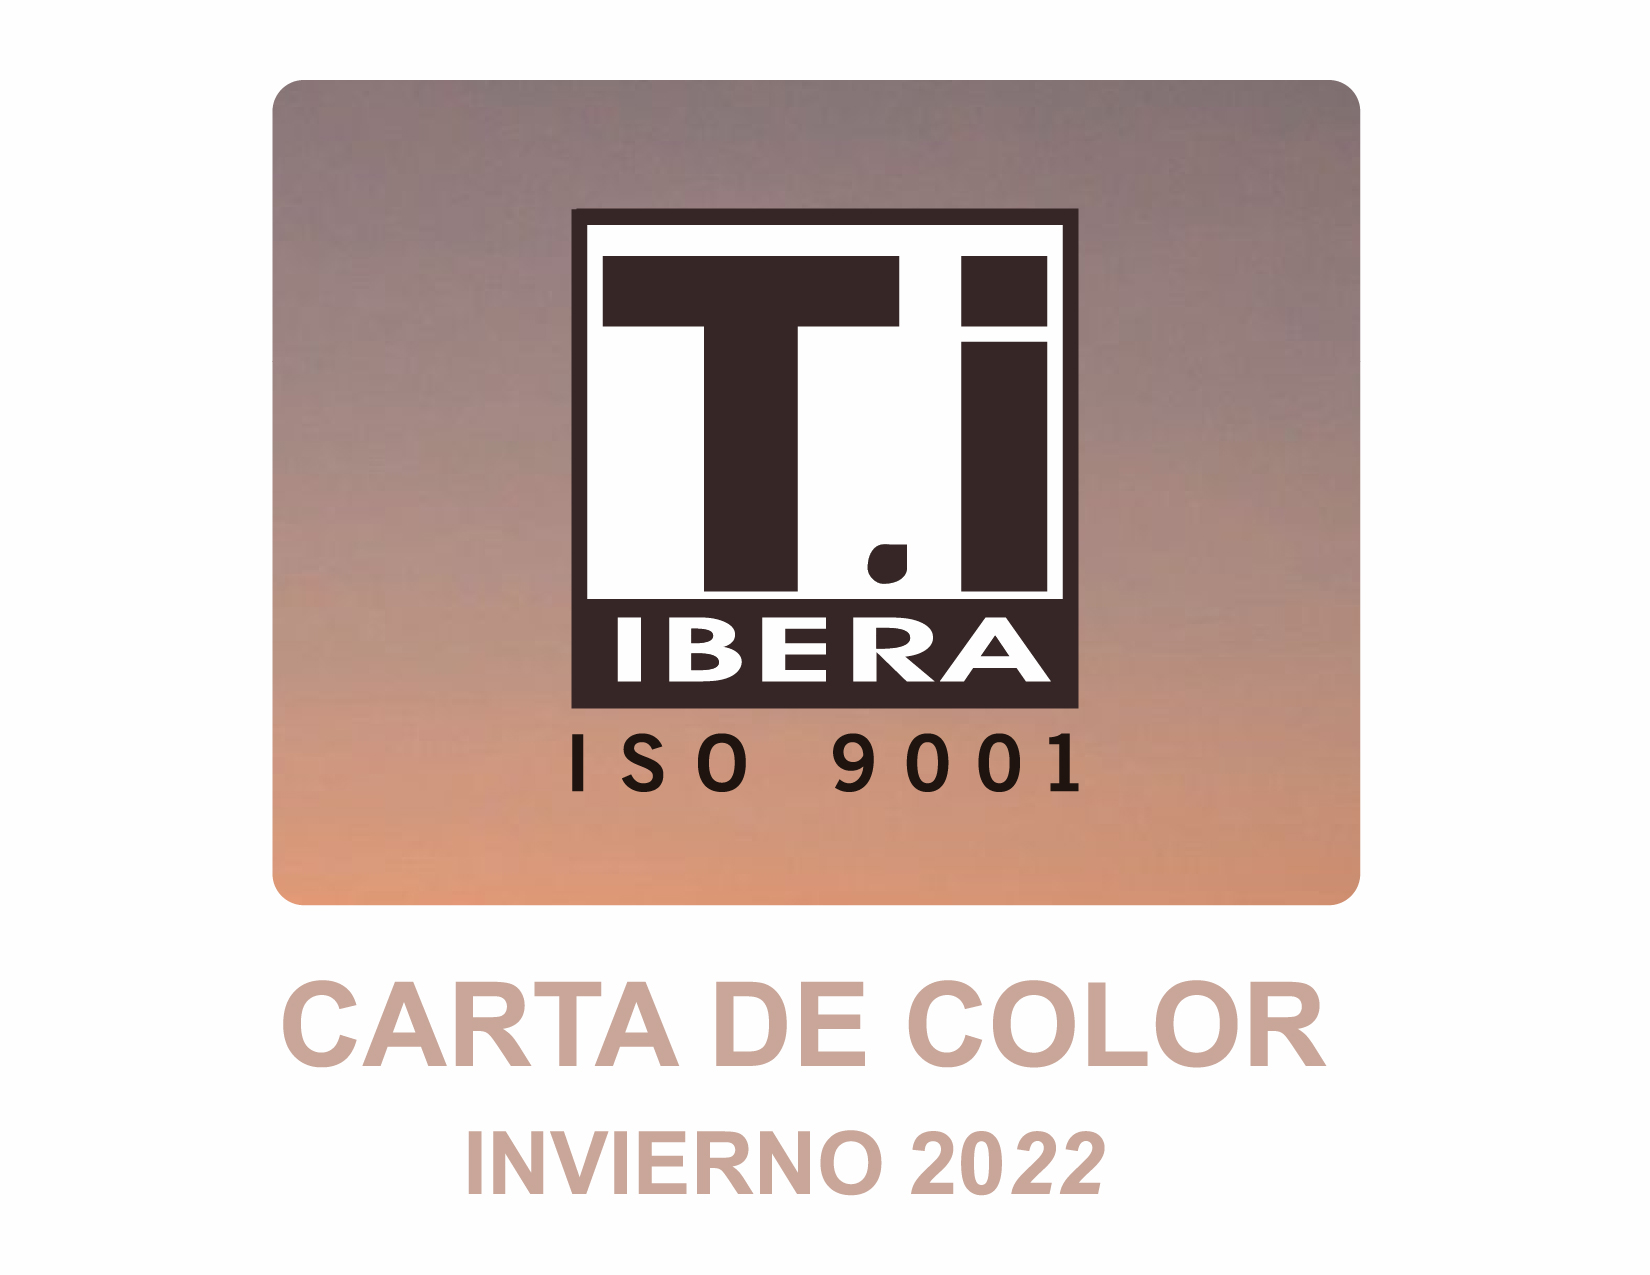 CARTA DE COLOR COLLAGE INV 22_-01